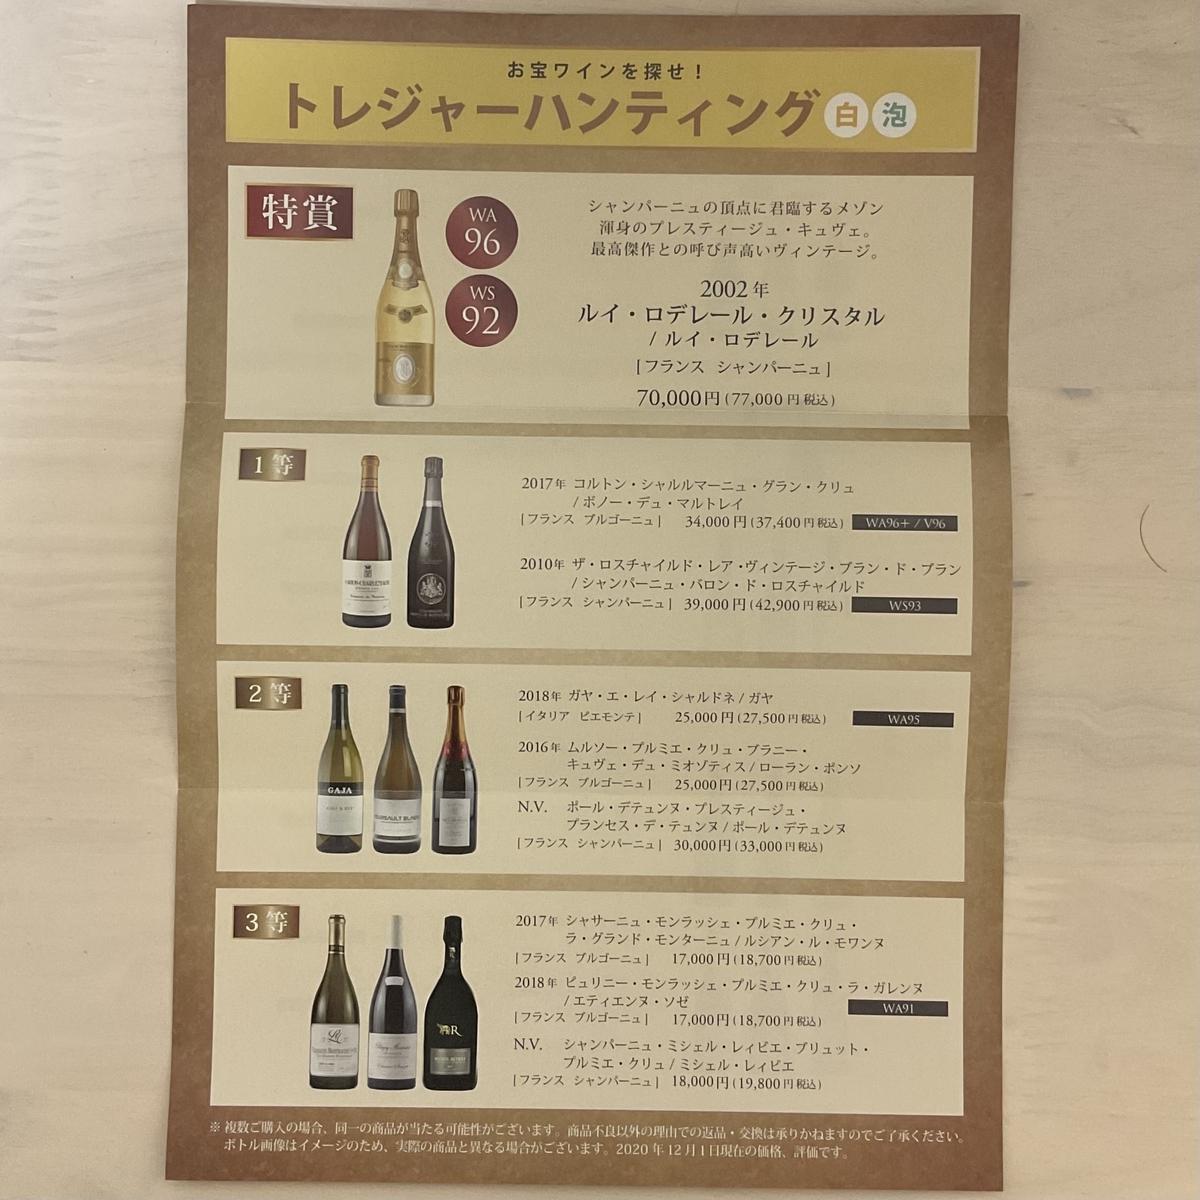 f:id:wine_cheese:20210126224009j:plain